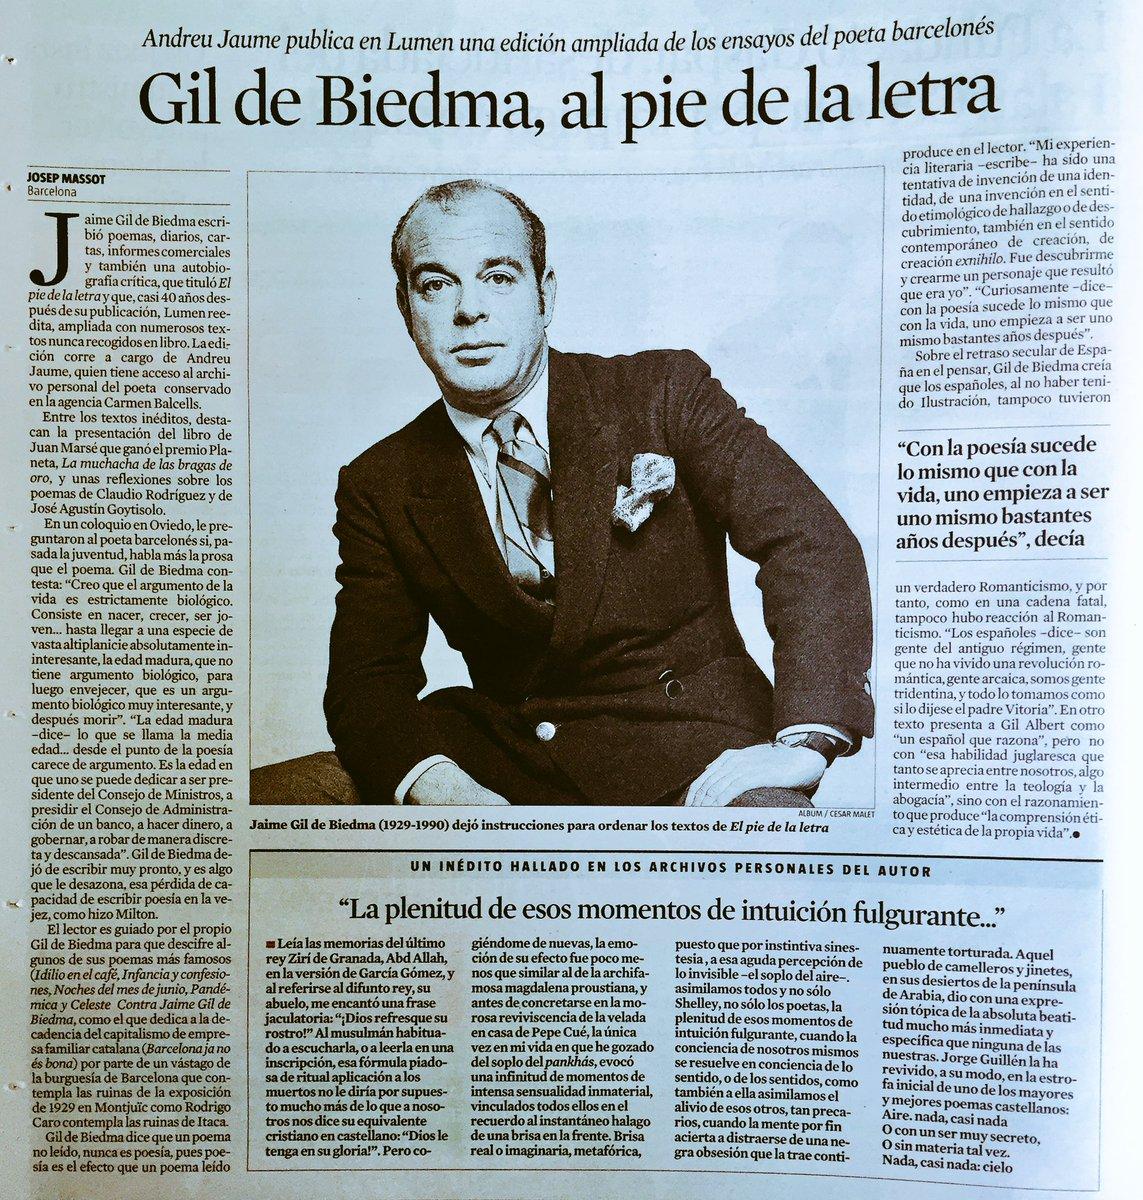 RT @TorrasLuis: Todo lo que toca Andreu Jaume gana enteros. @meigul https://t.co/iDCzfNoNuf